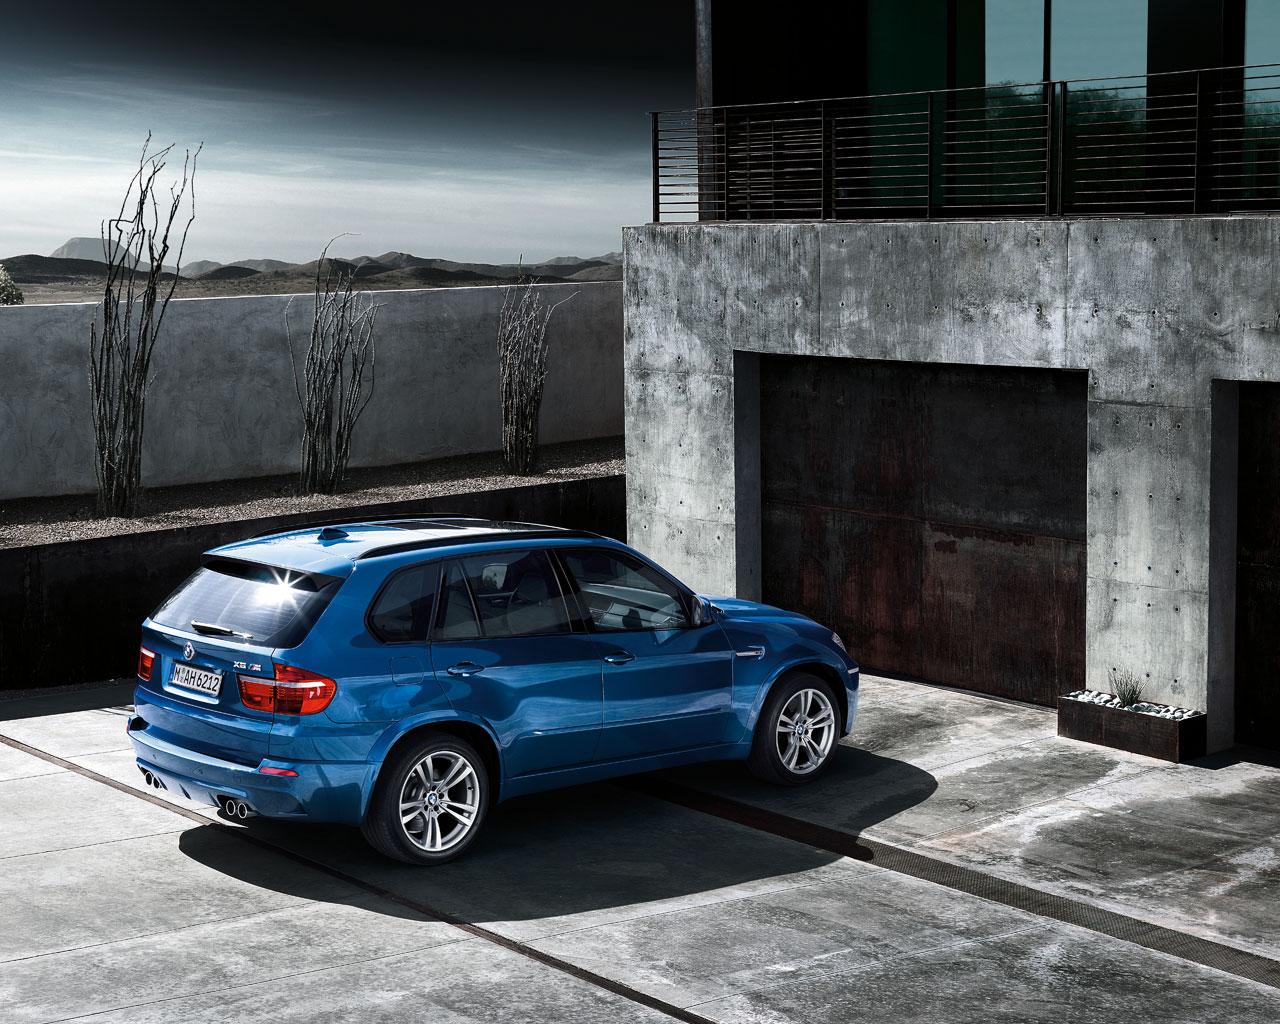 http://4.bp.blogspot.com/-MYcdQp8U5nE/TgBWMGpxNEI/AAAAAAAAD6k/8kPaPvo-64M/s1600/BMW-X5-M-Wallpaper-Gallery-3.jpg